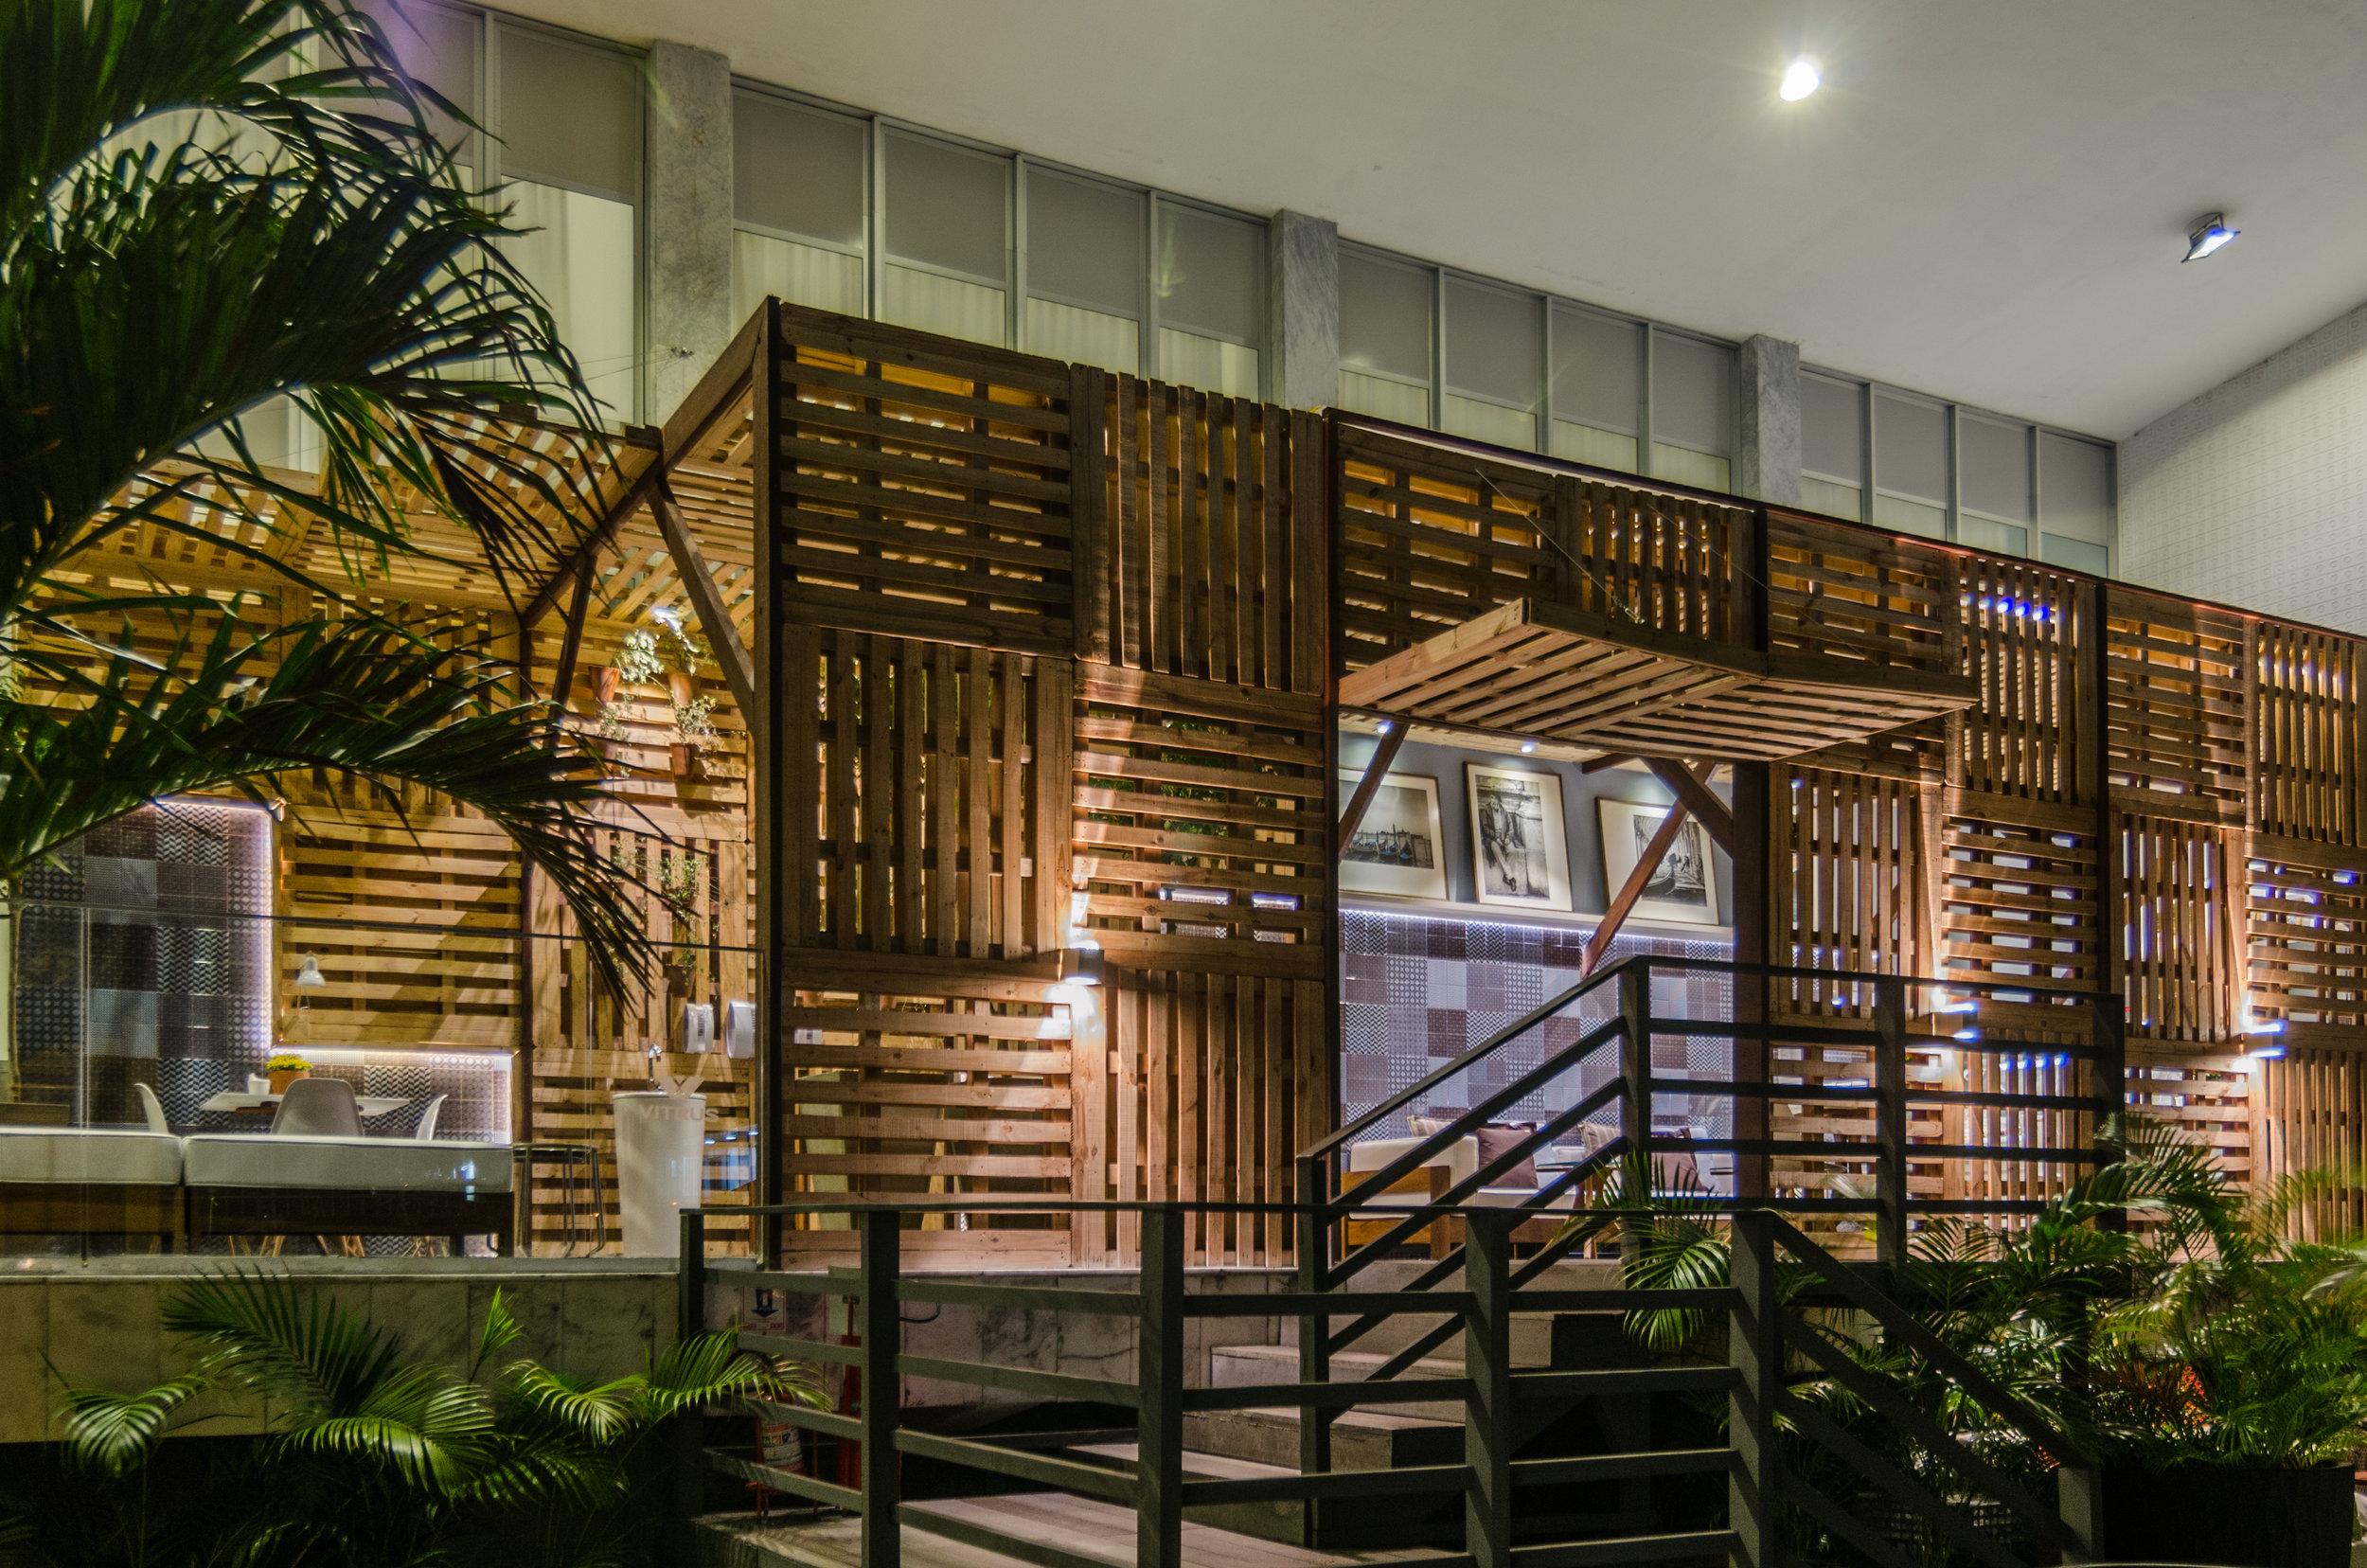 projeto-arquitetonico-cuoredipannacc-duo-arquitetura-014.jpg